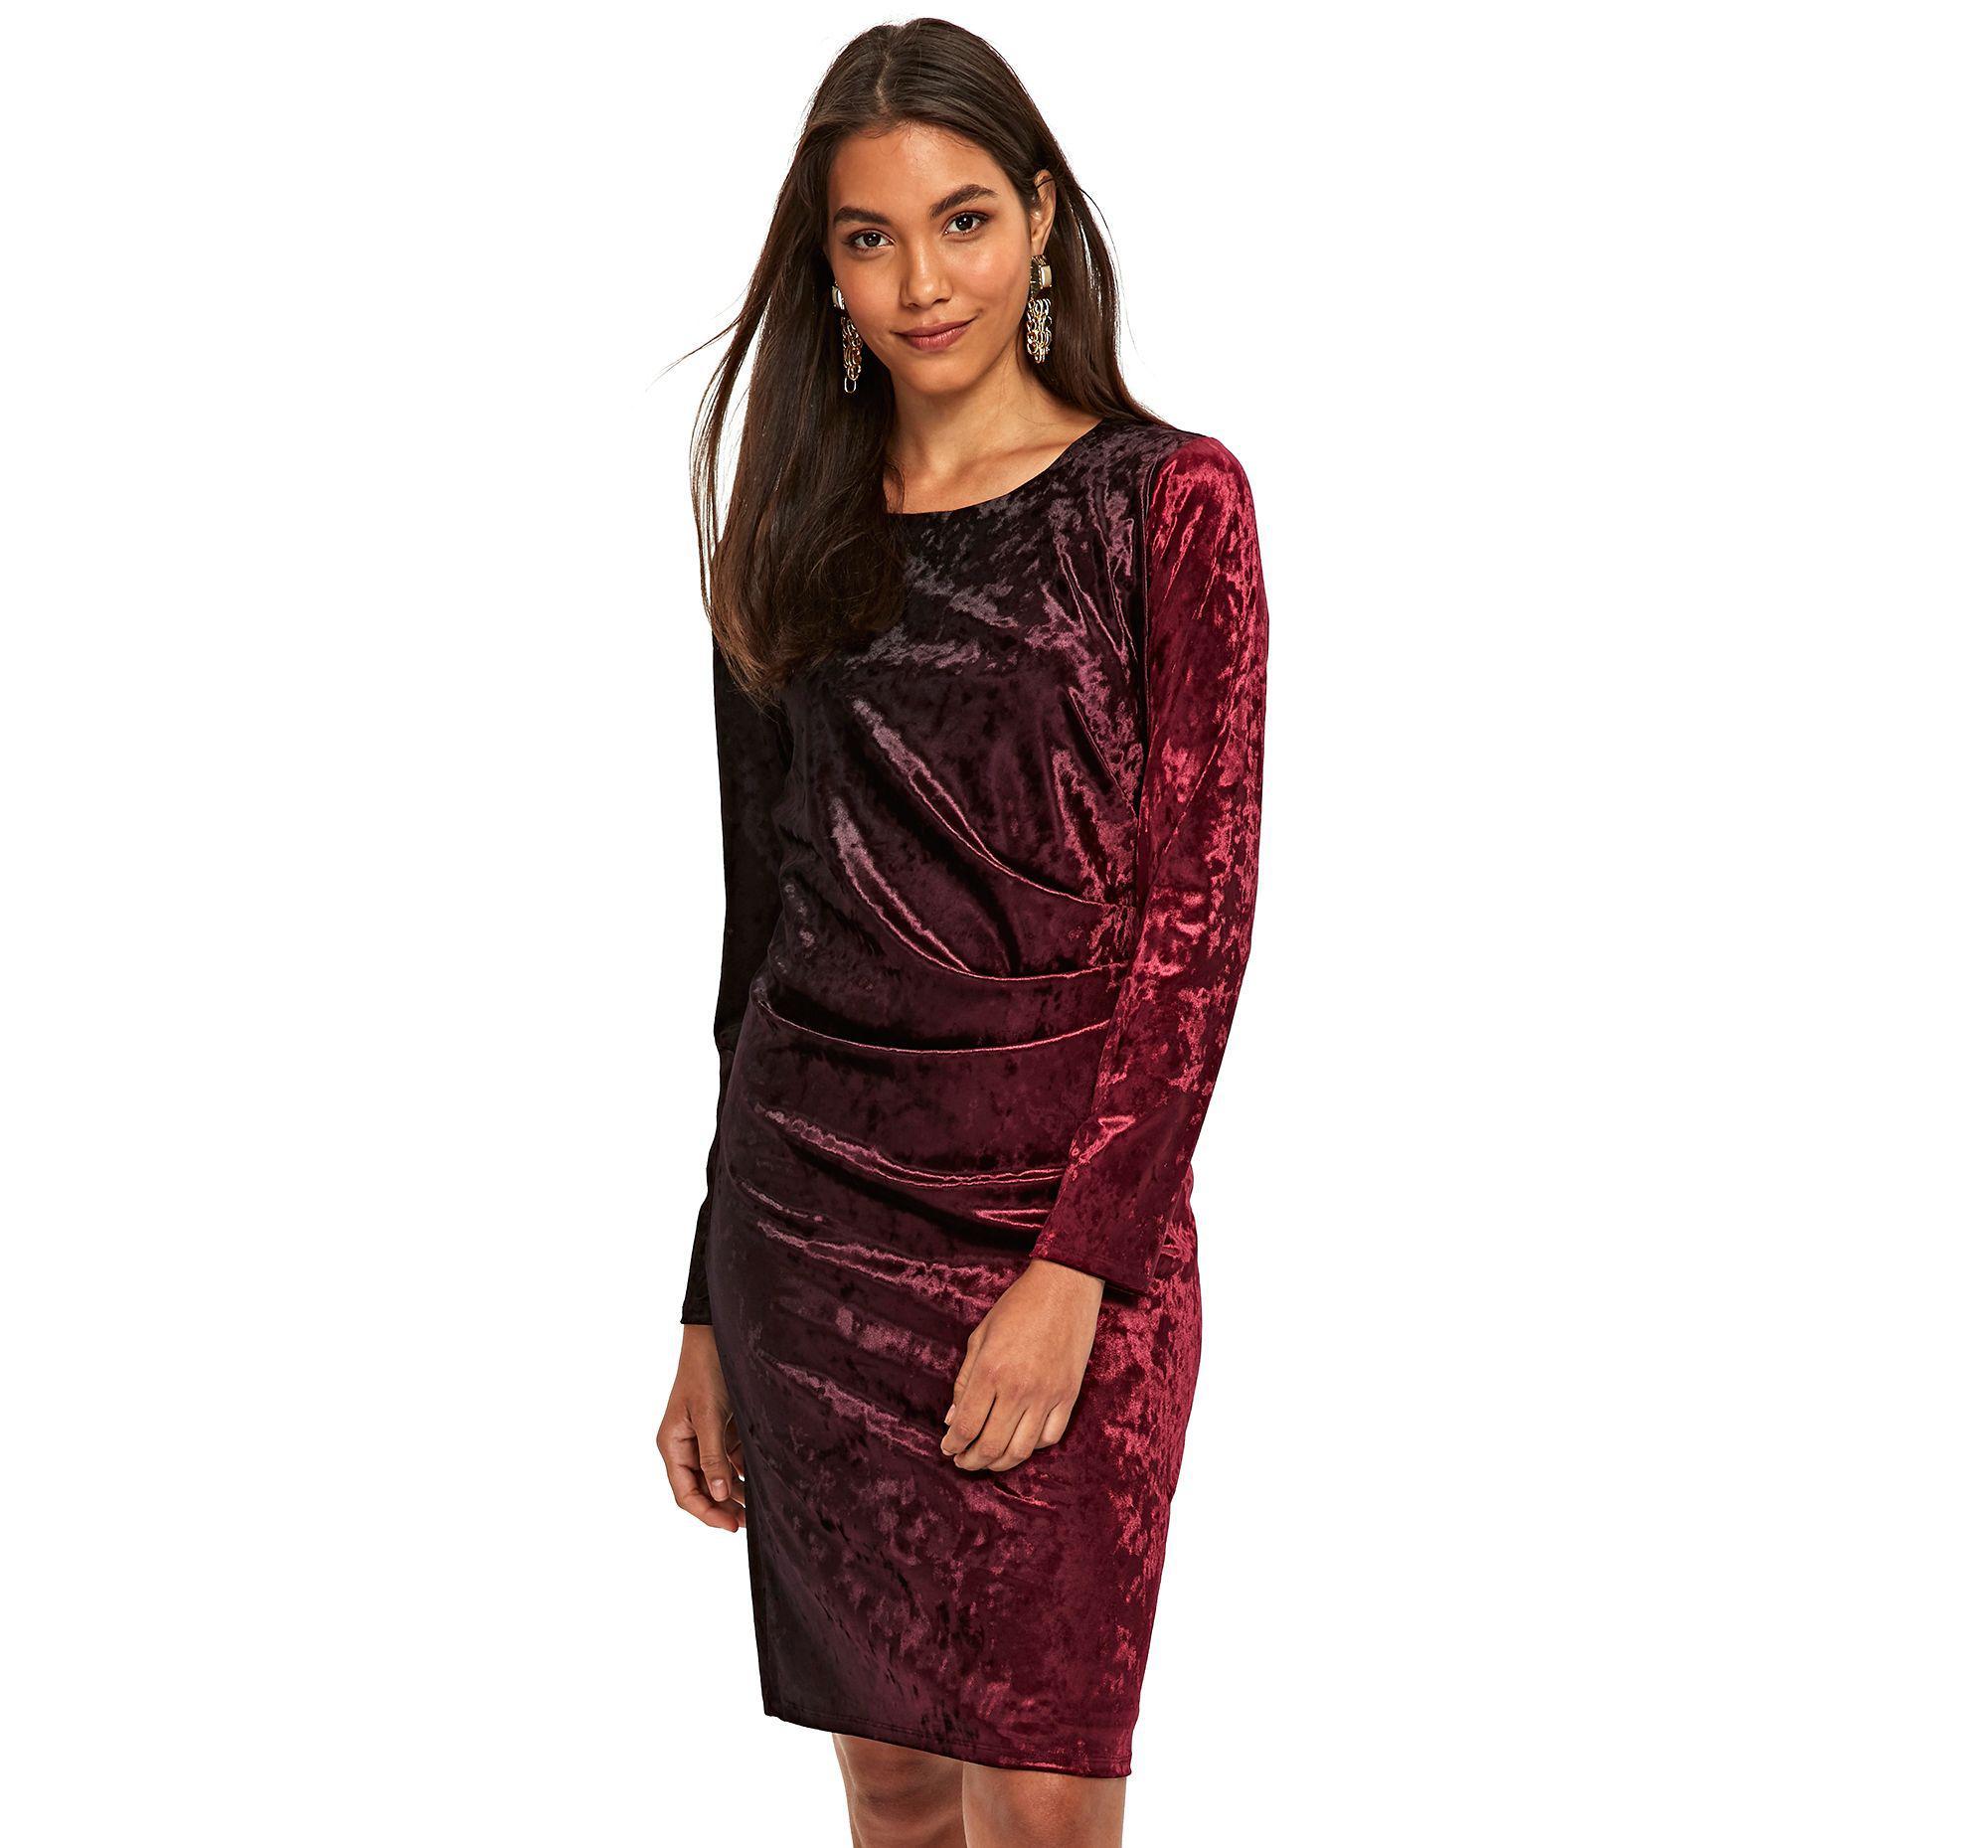 edc4fe7f38c3 Wallis Black Cosmic Ruched Side Shift Dress in Black - Lyst